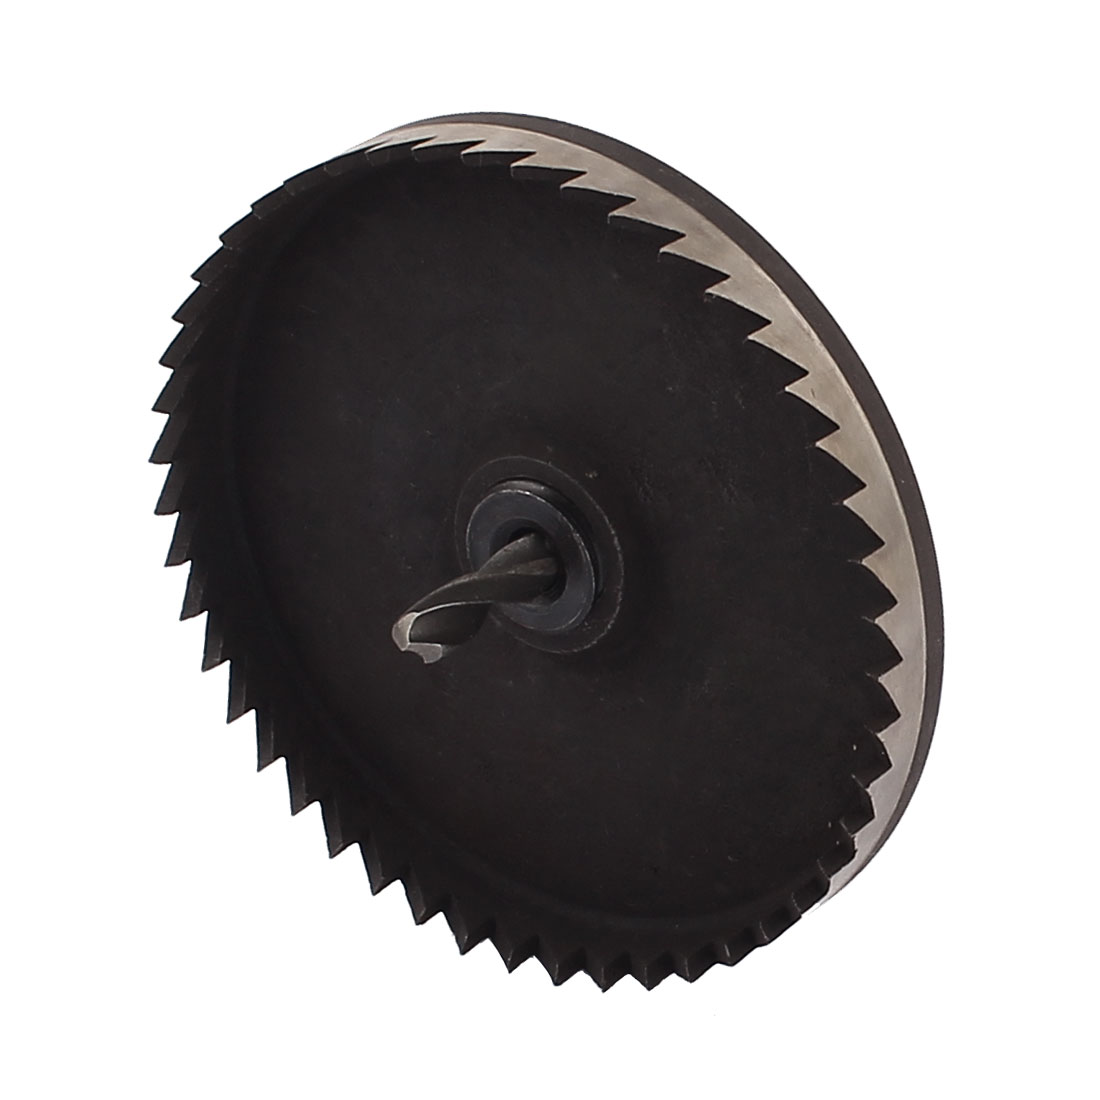 85mm Cutting Dia 10mm Triangle Shank 6mm Twist Drilling Bit Hole Saw Cutter